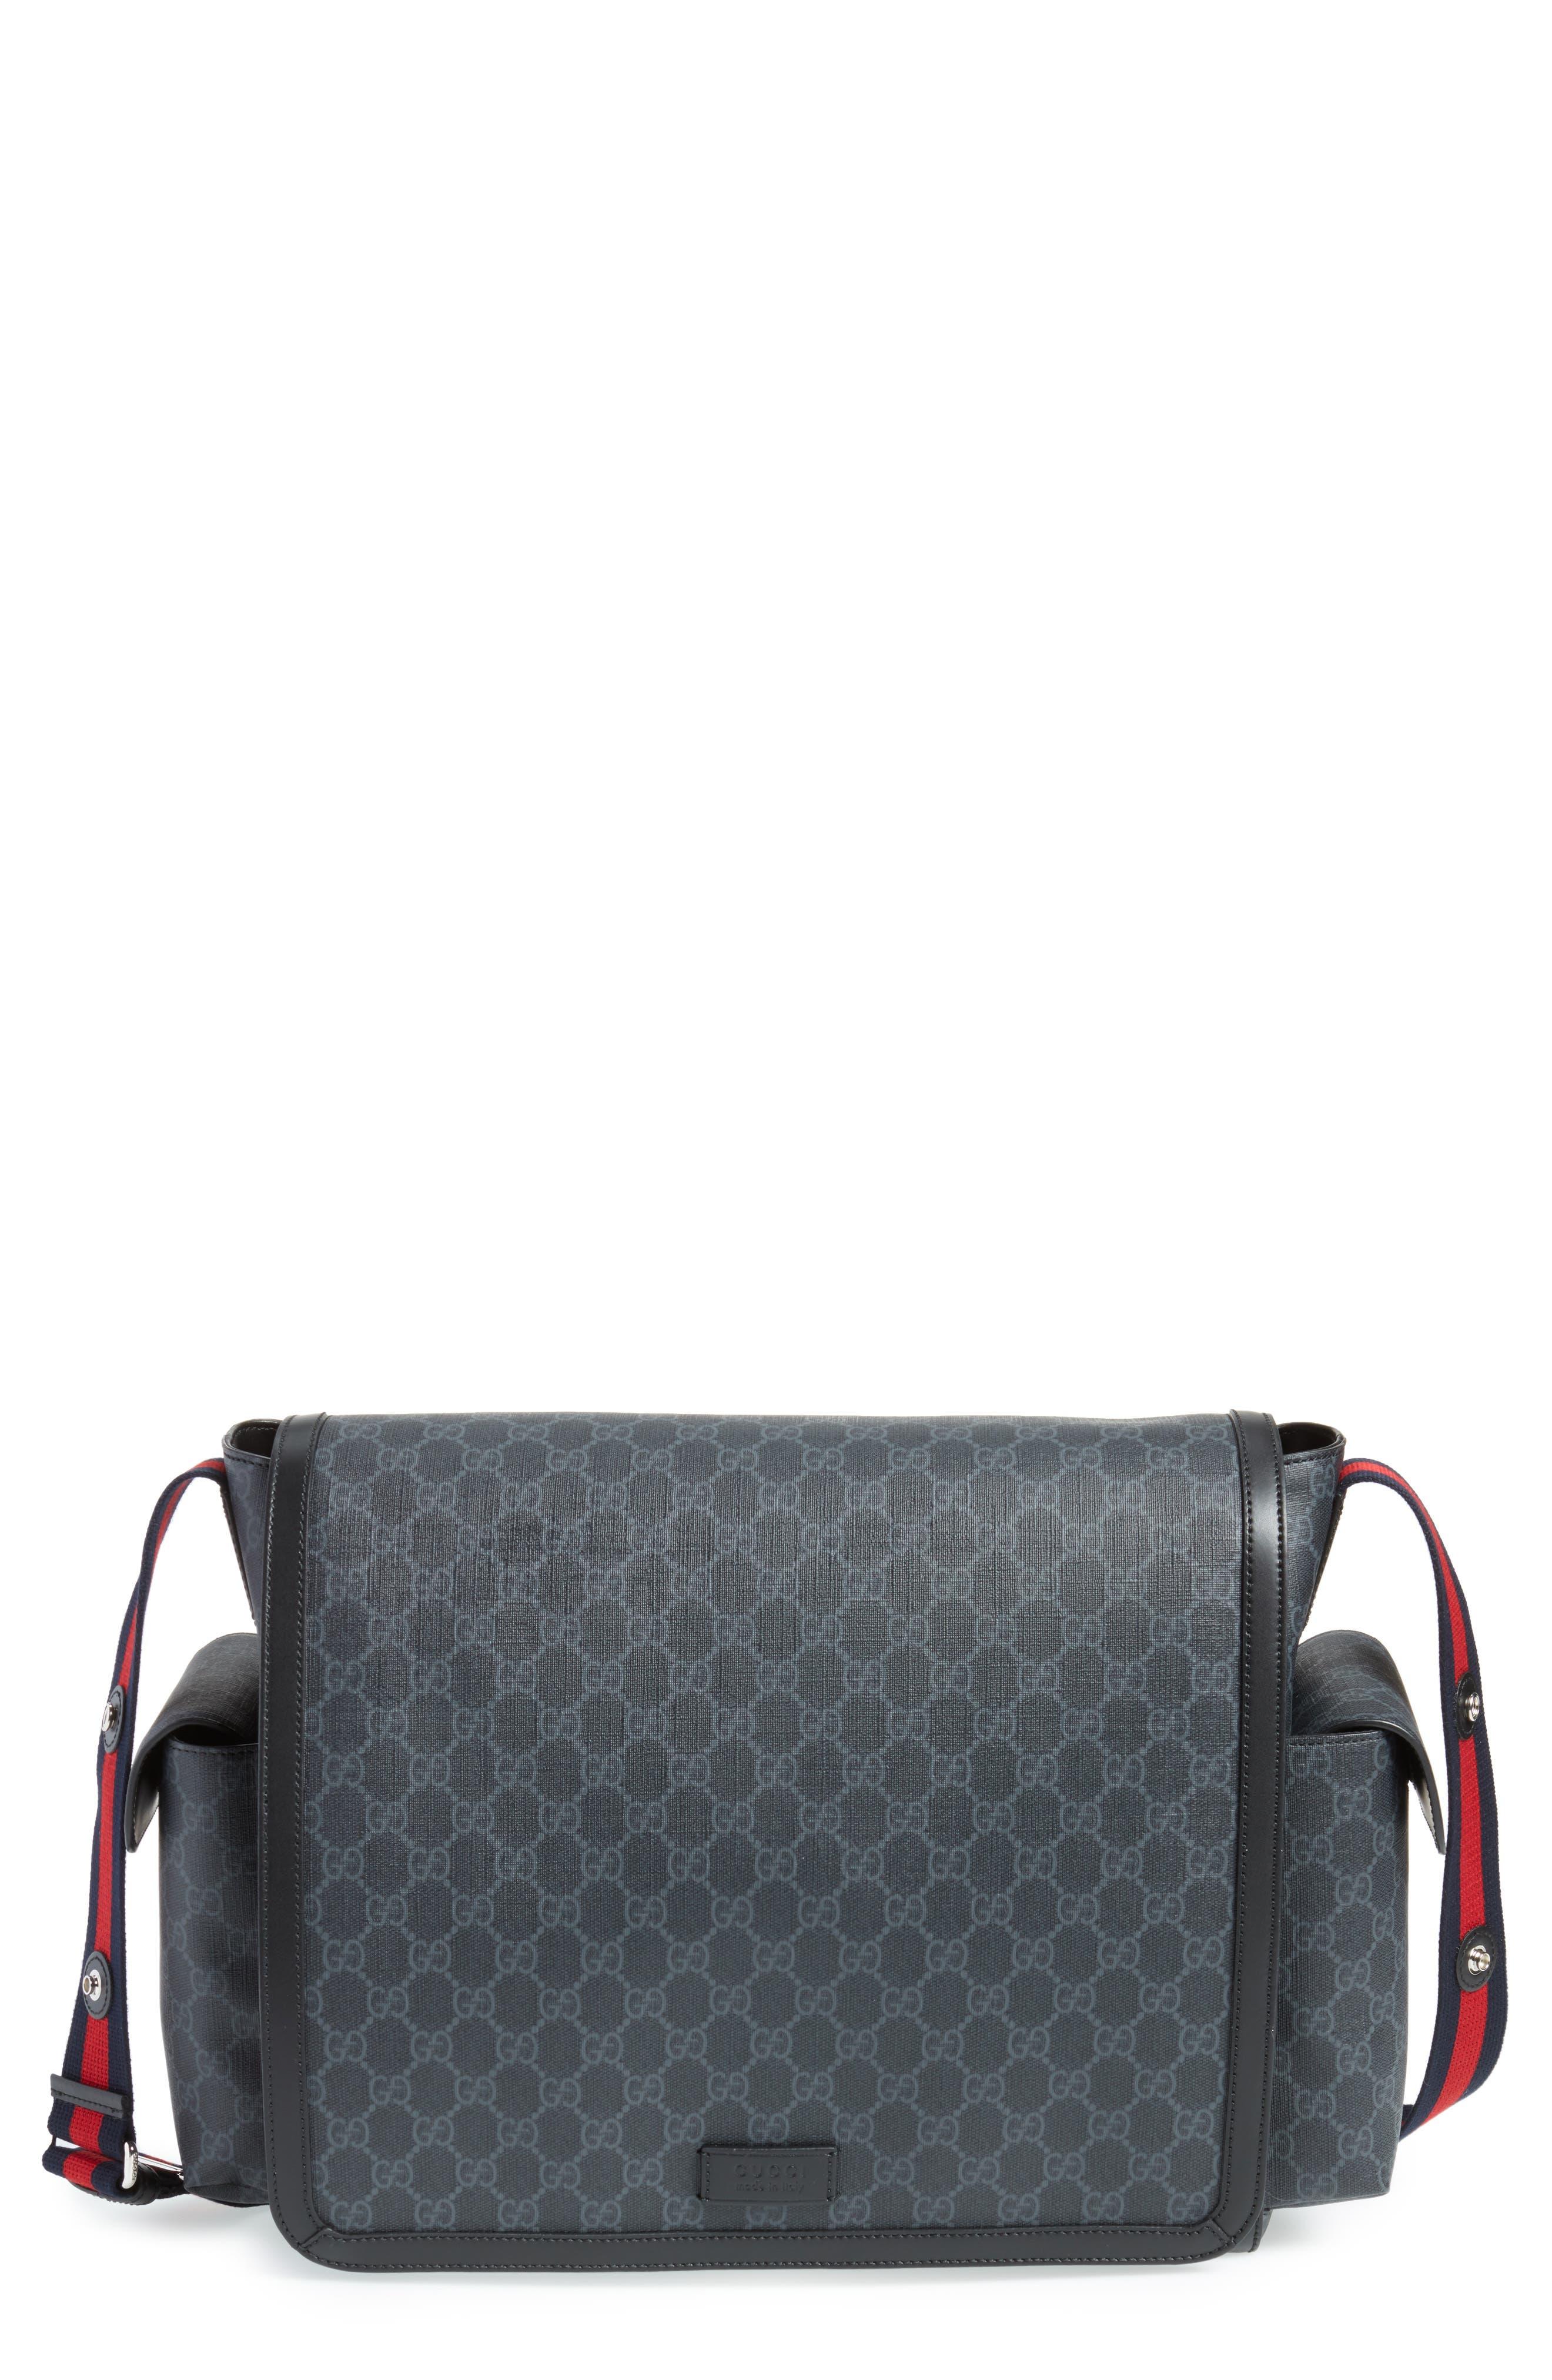 GG Supreme Canvas Diaper Bag,                             Main thumbnail 1, color,                             BLACK